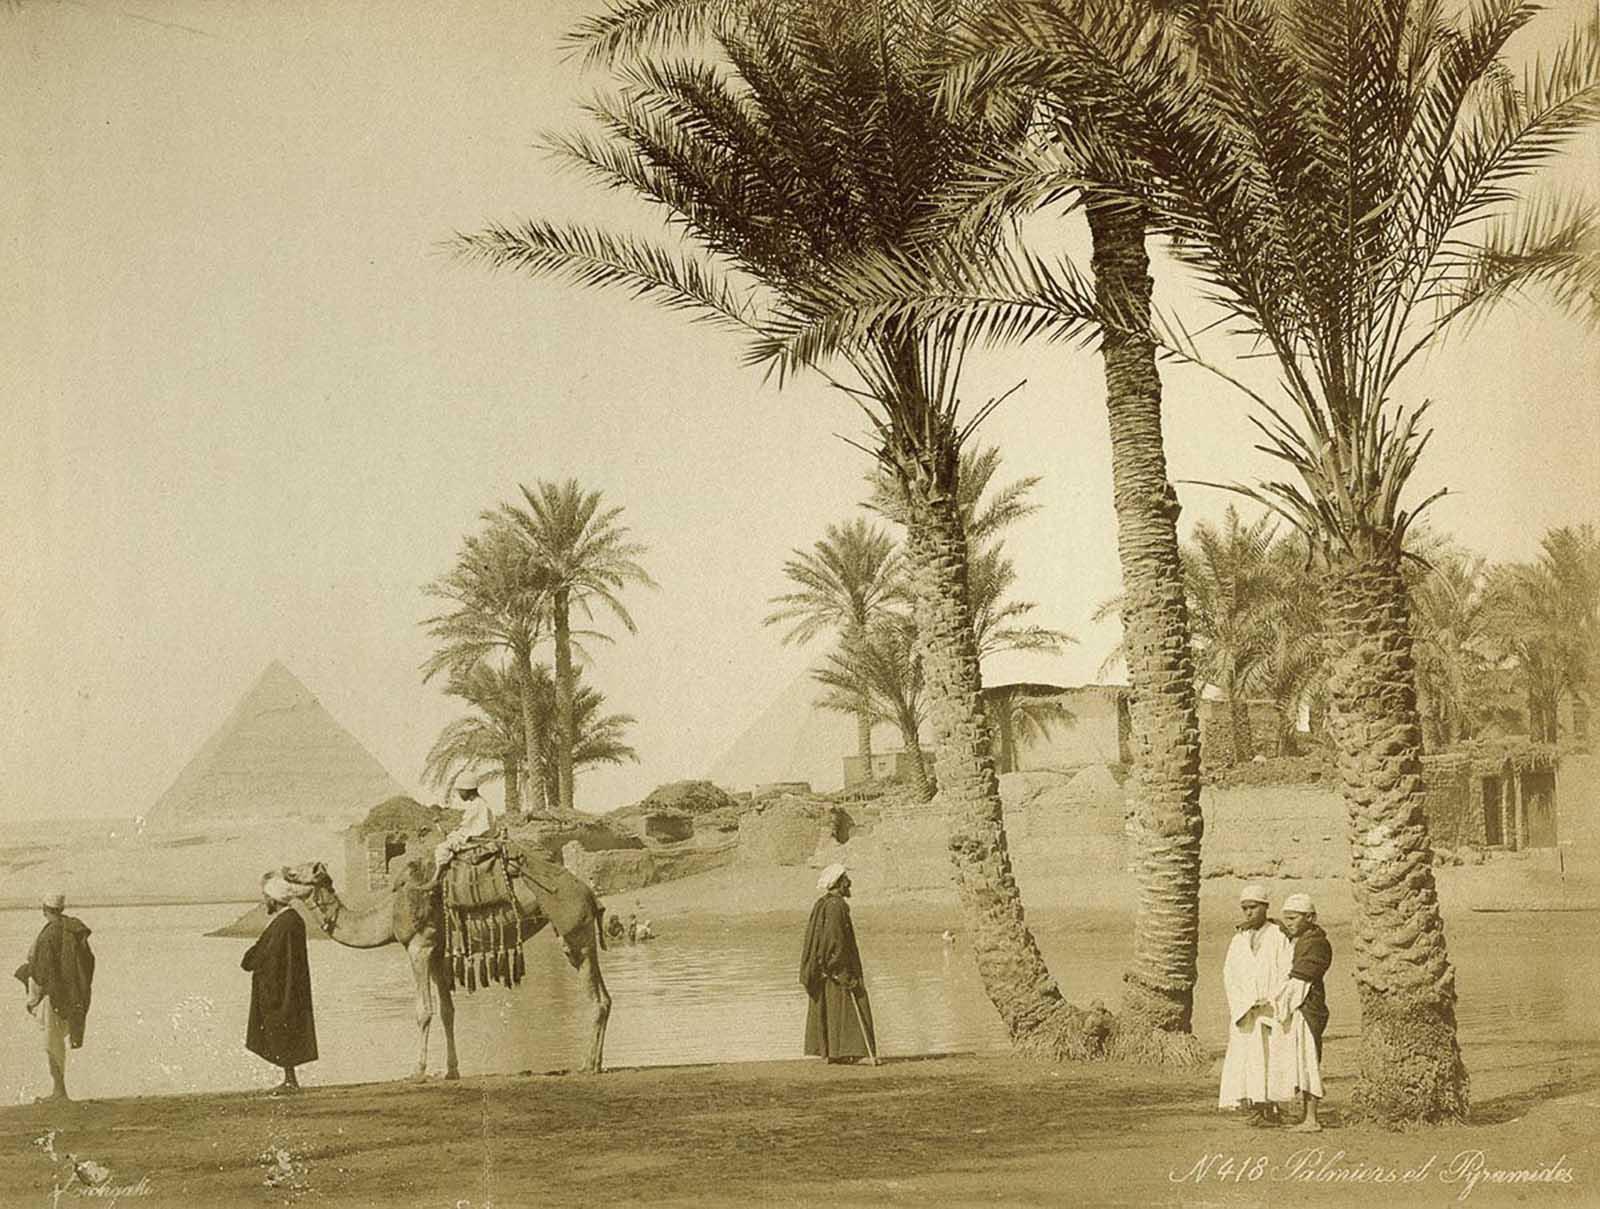 Vista das pirâmides